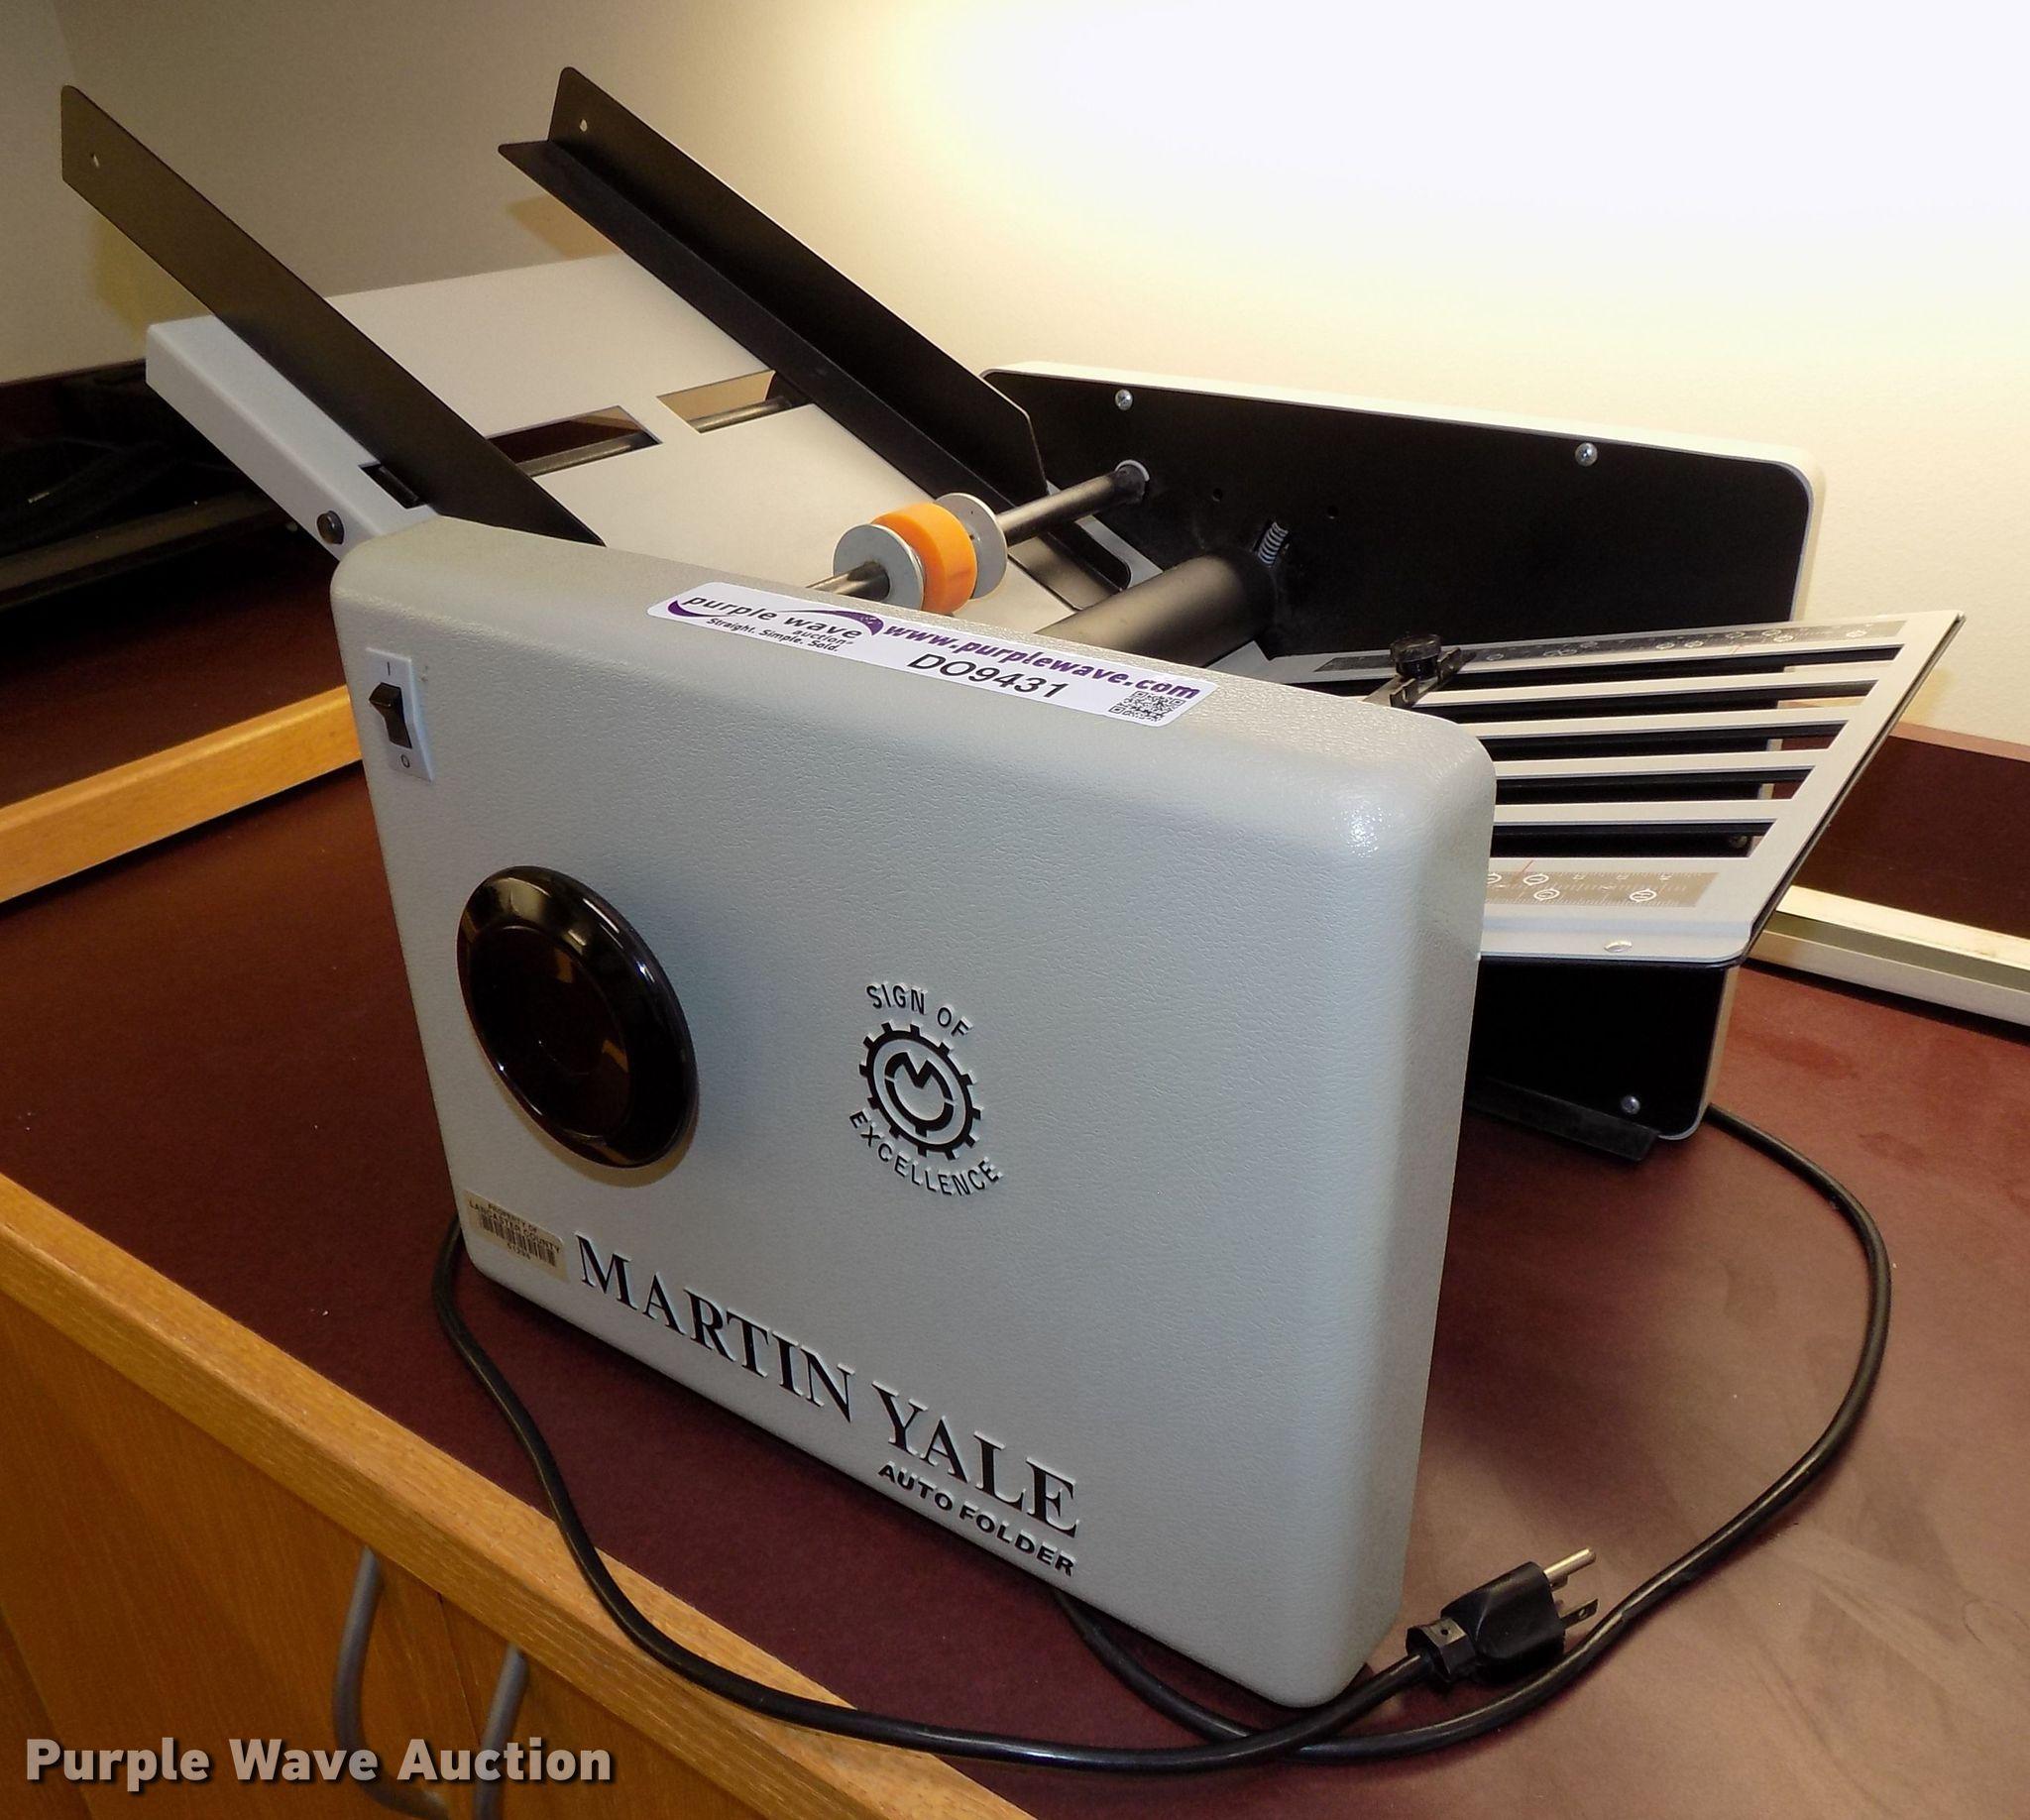 Martin Yale 1501 Cv 7 Electric Auto Folder Folding Machine In Lincoln Ne Item Do9431 Sold Purple Wave